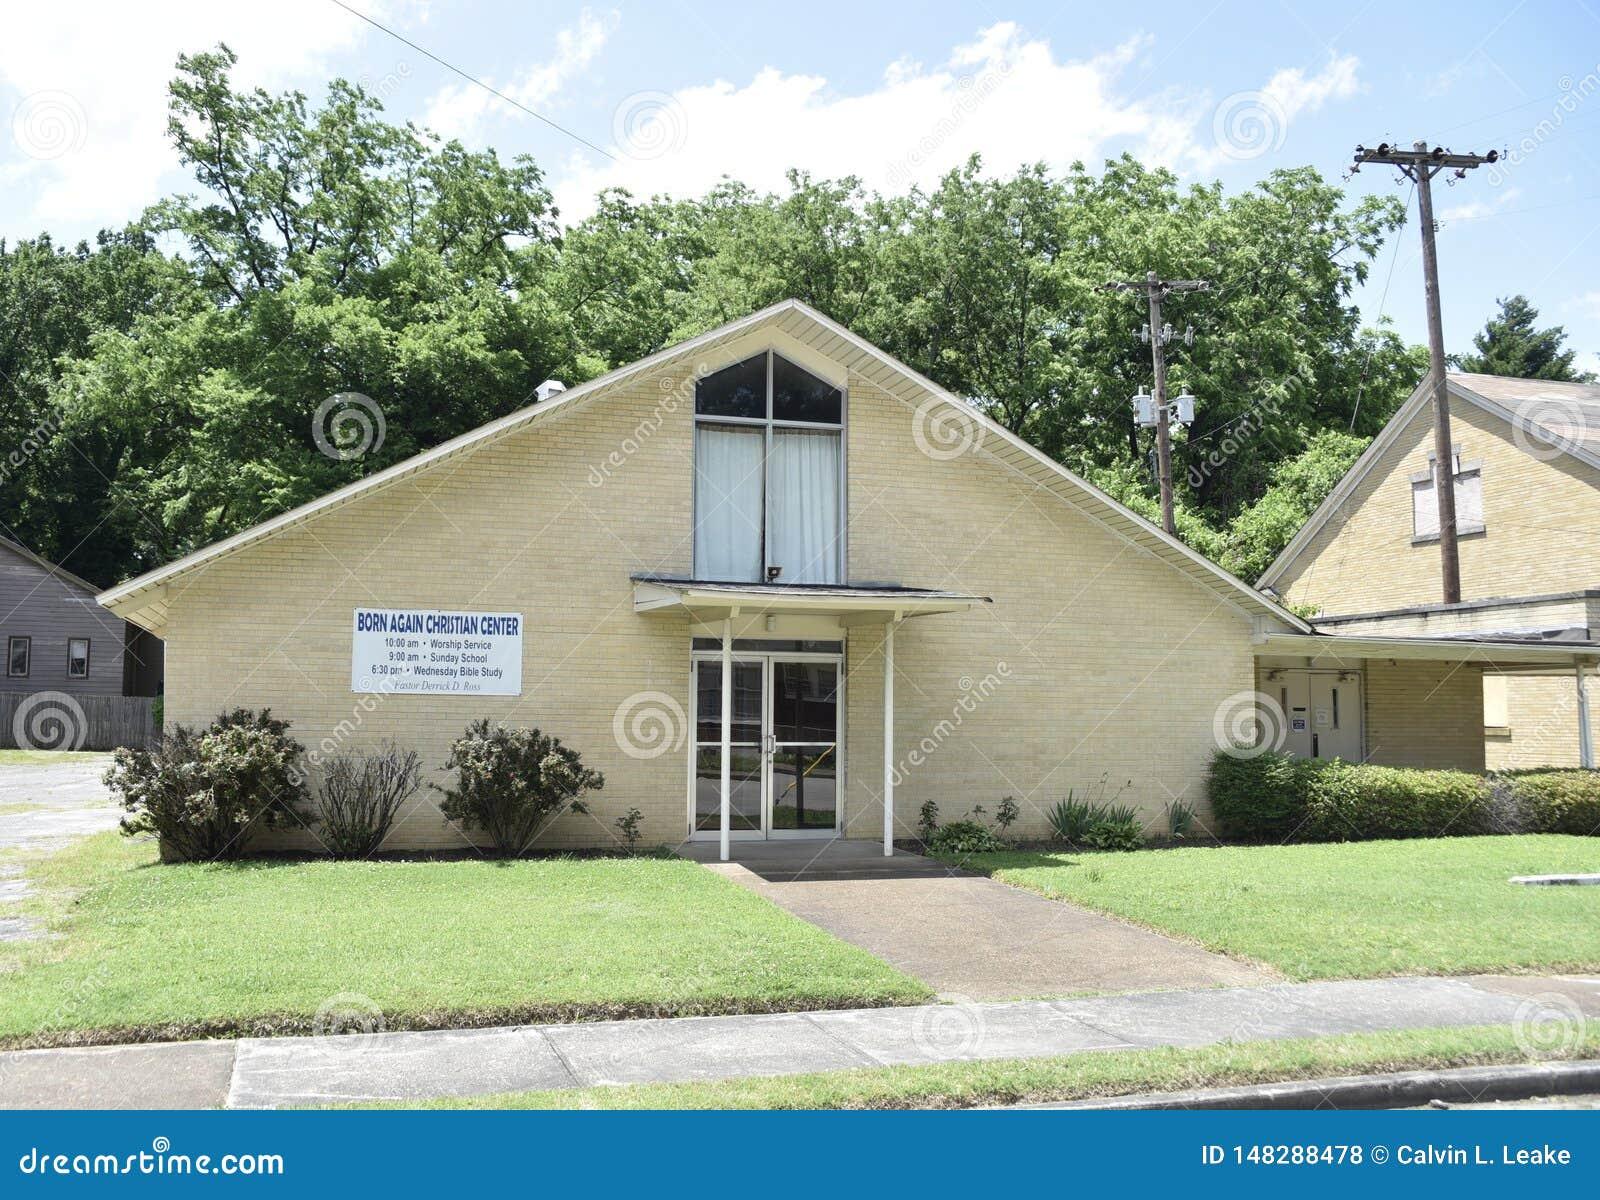 Born Again Christian Center, Memphis, Tennessee